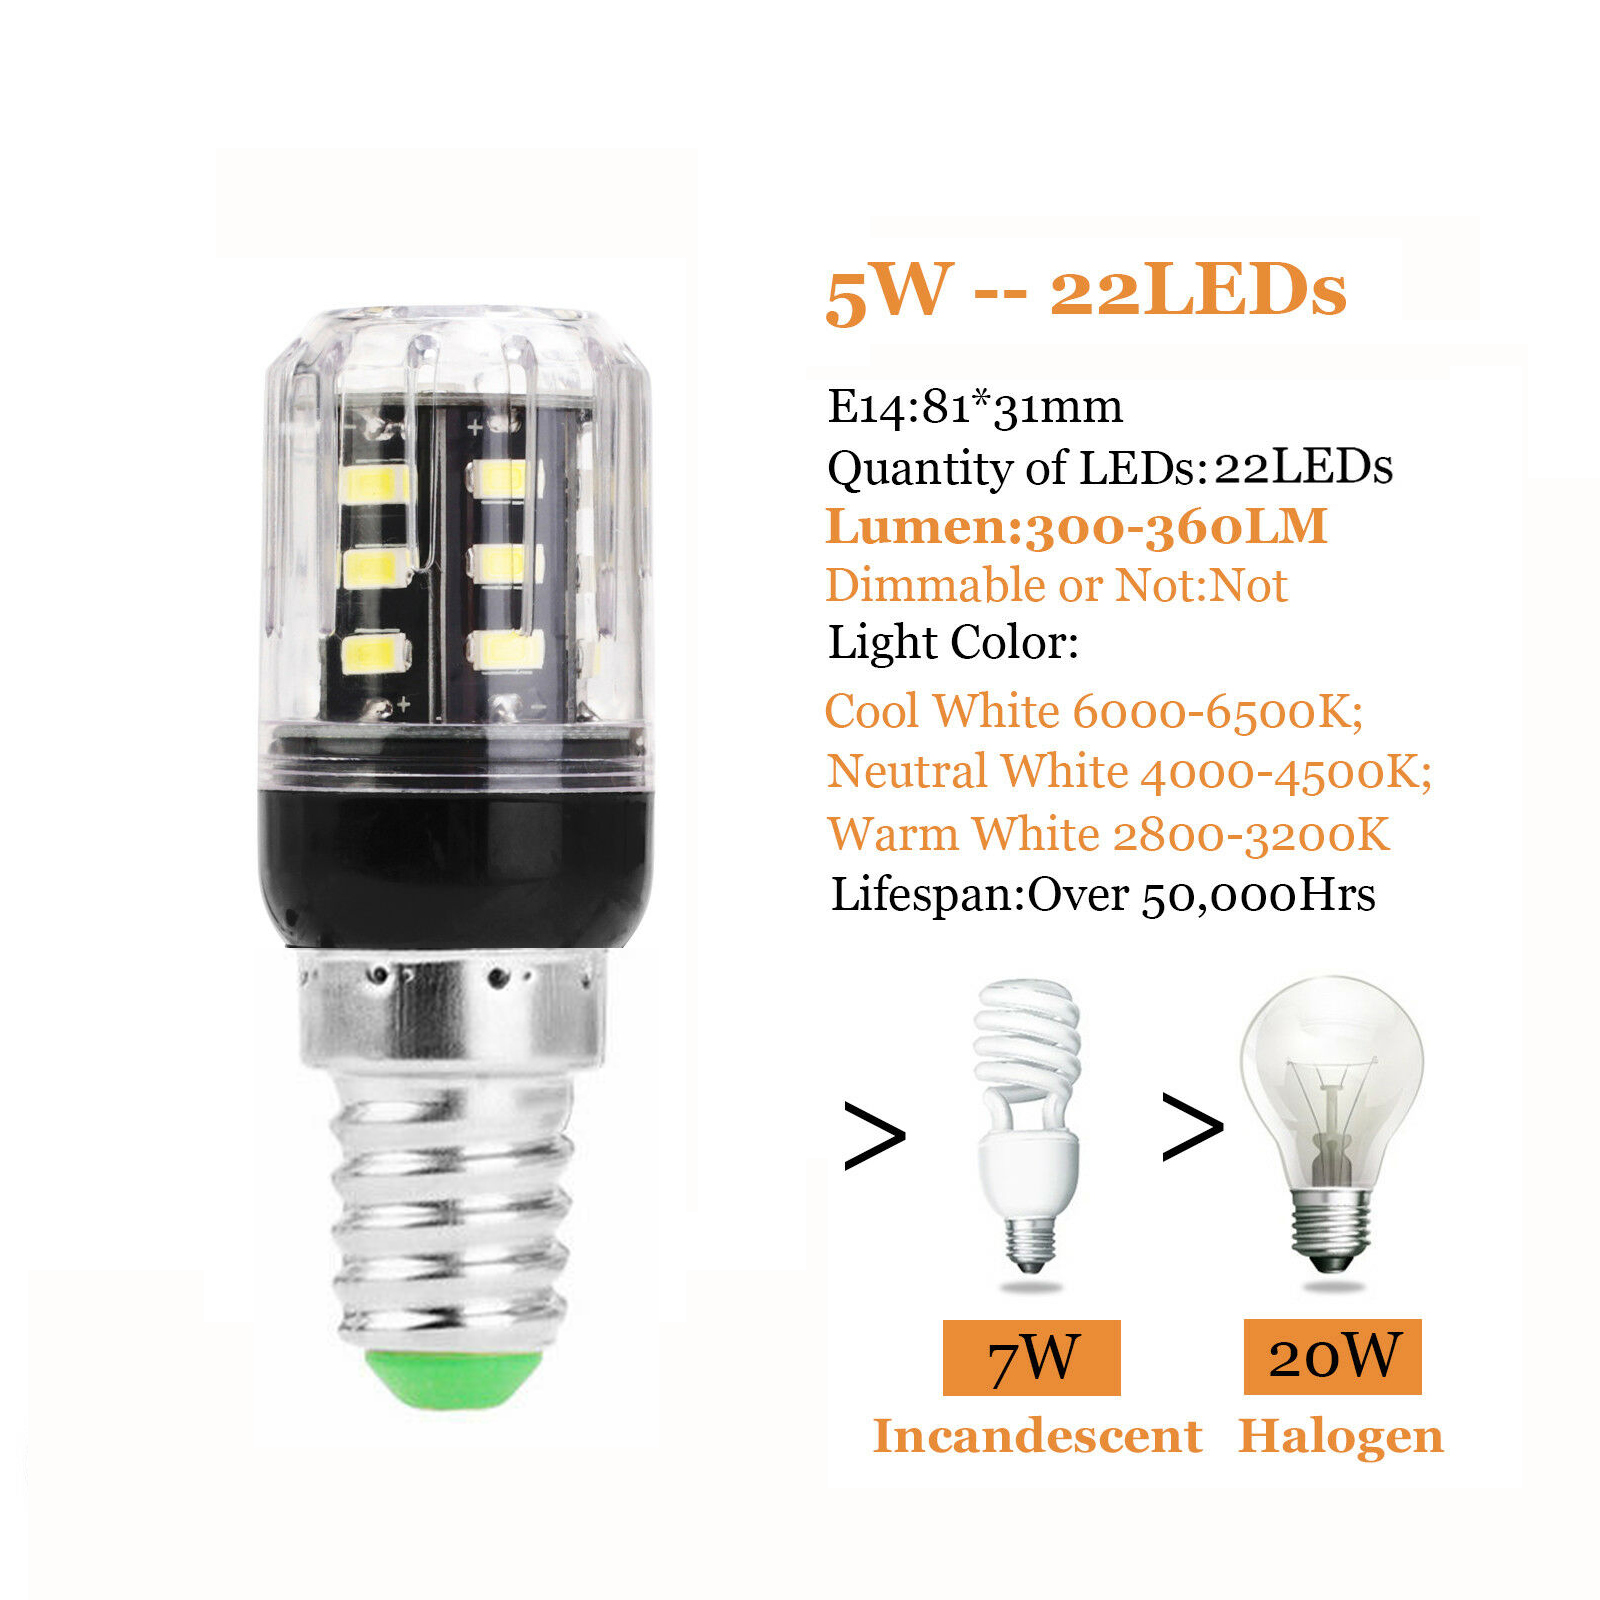 E14 LED Corn Bulb 5W 6W 7W 9W 10W 12W 15W 25W Lights Equival 20W 100W Halogen C